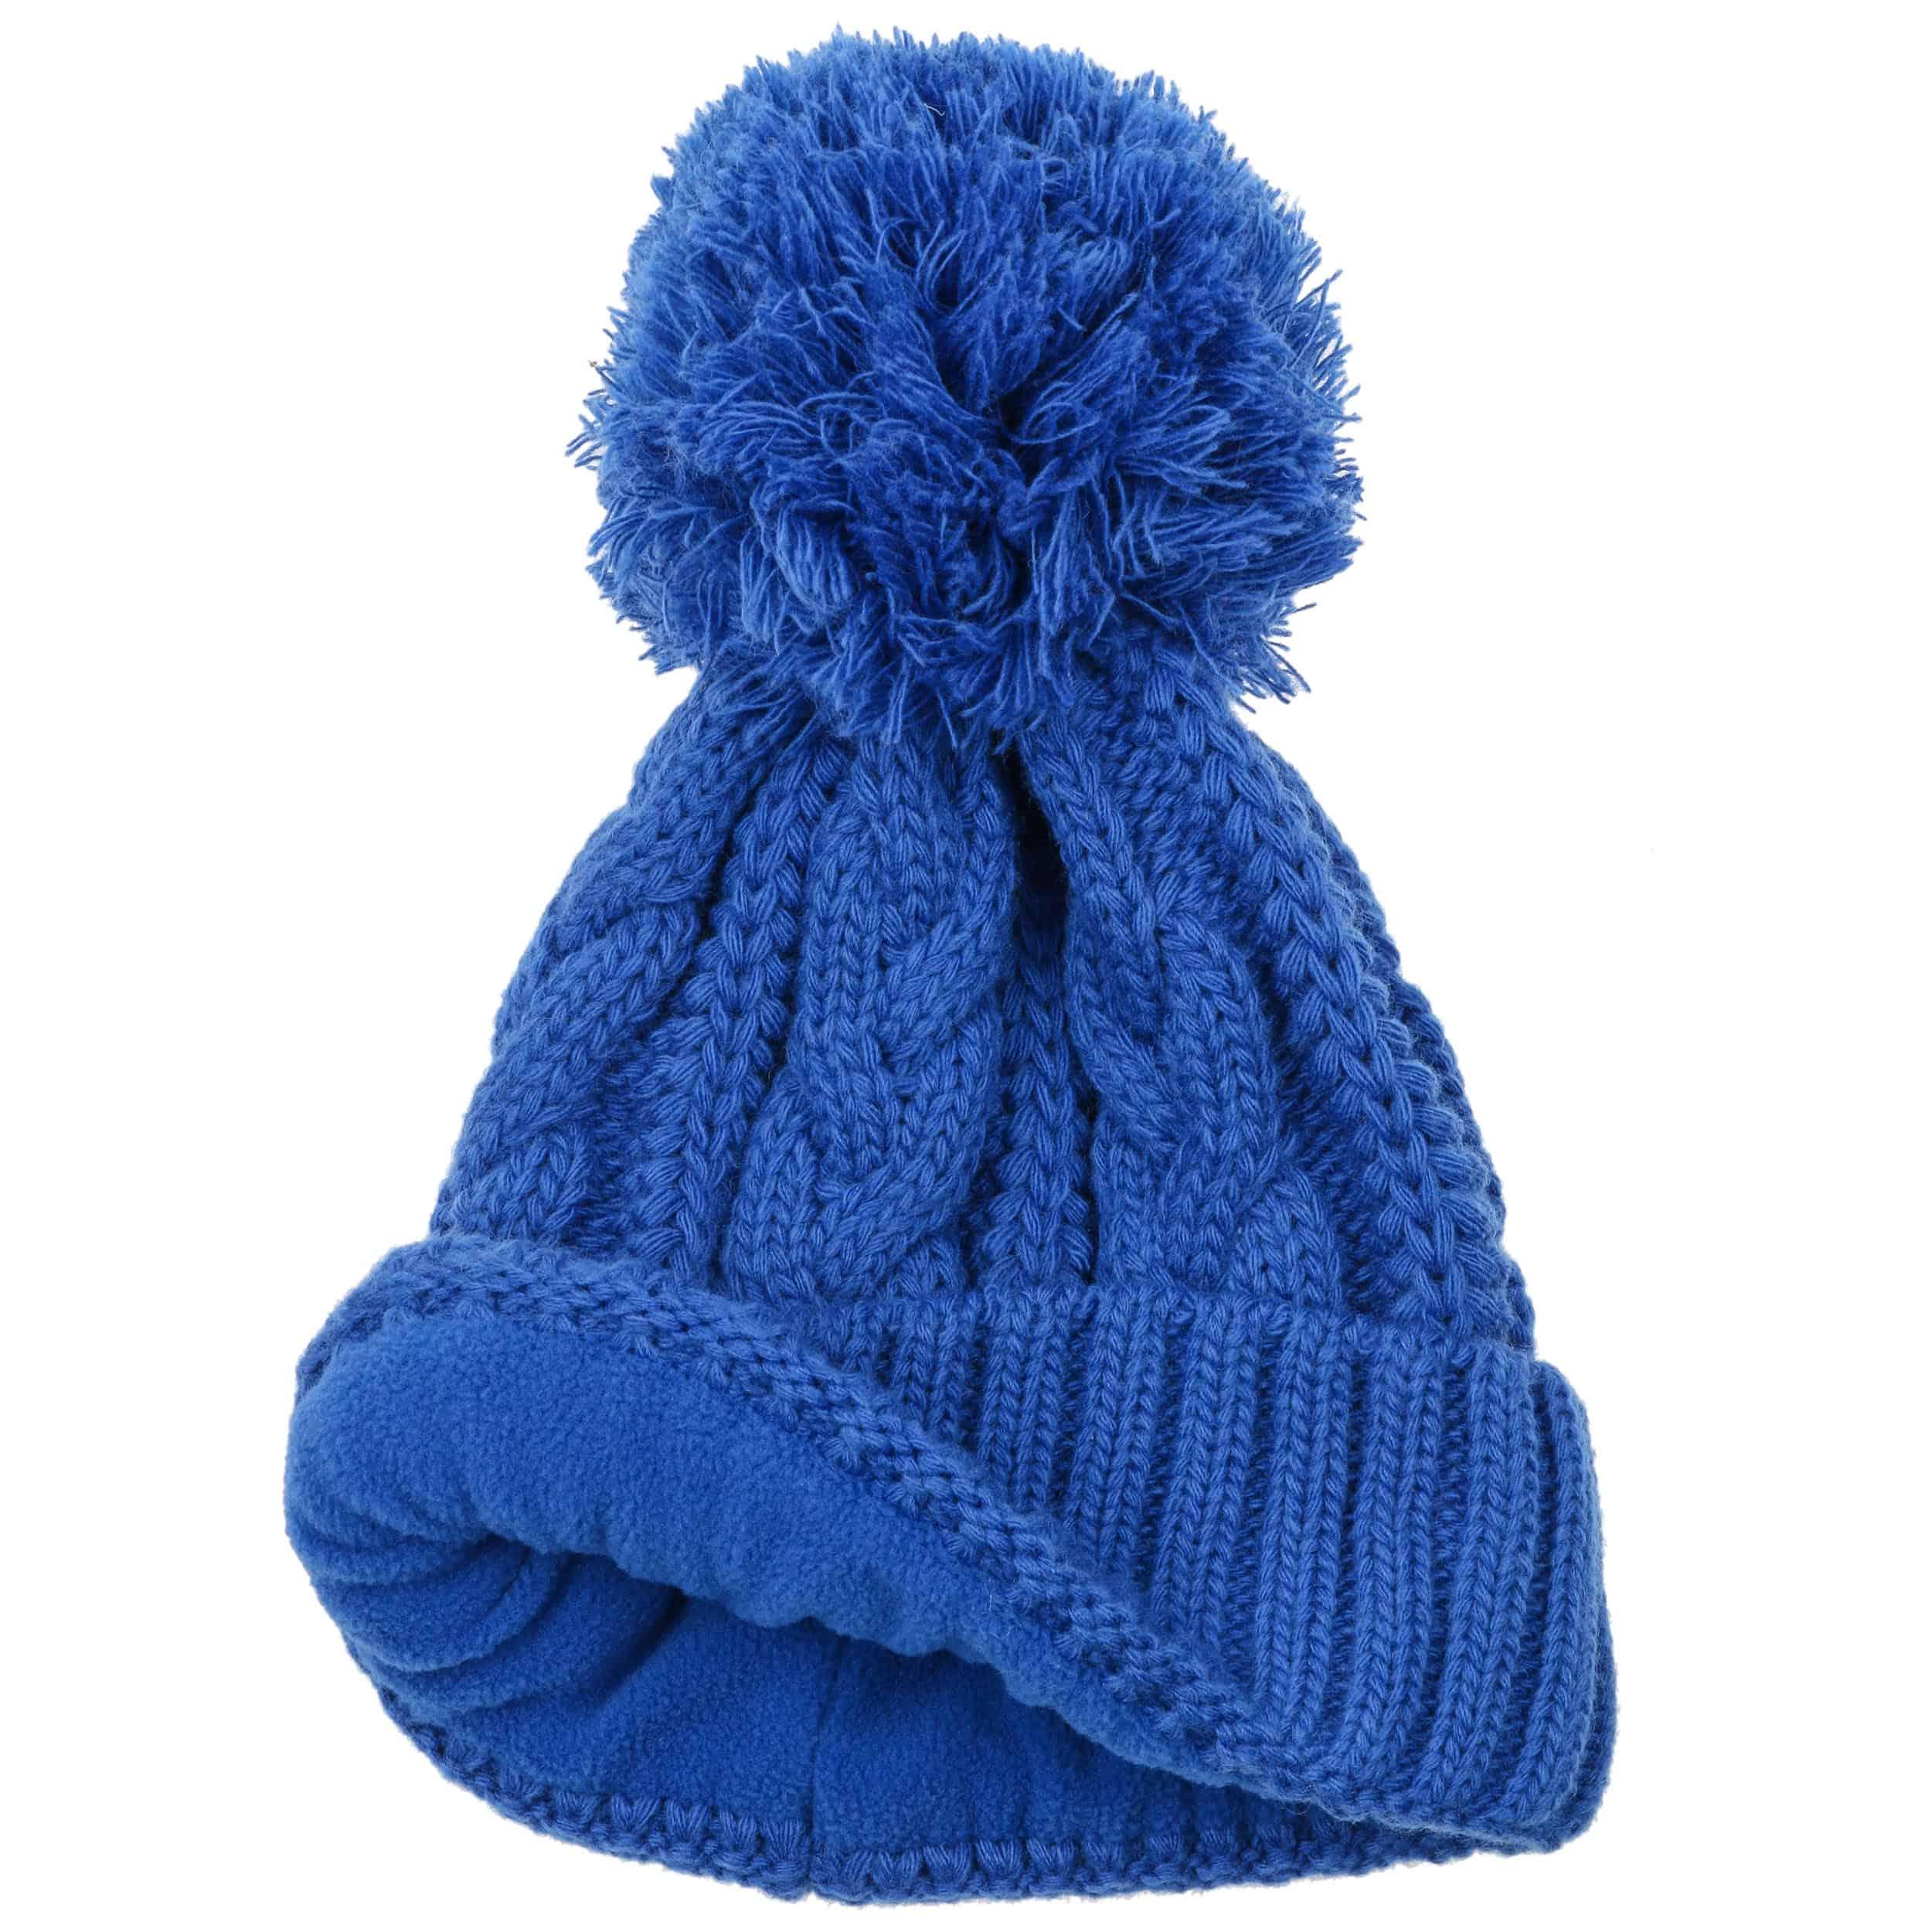 9b1d0309027 ... Giant Bobble Hat by McBURN - royal-blue 1 ...